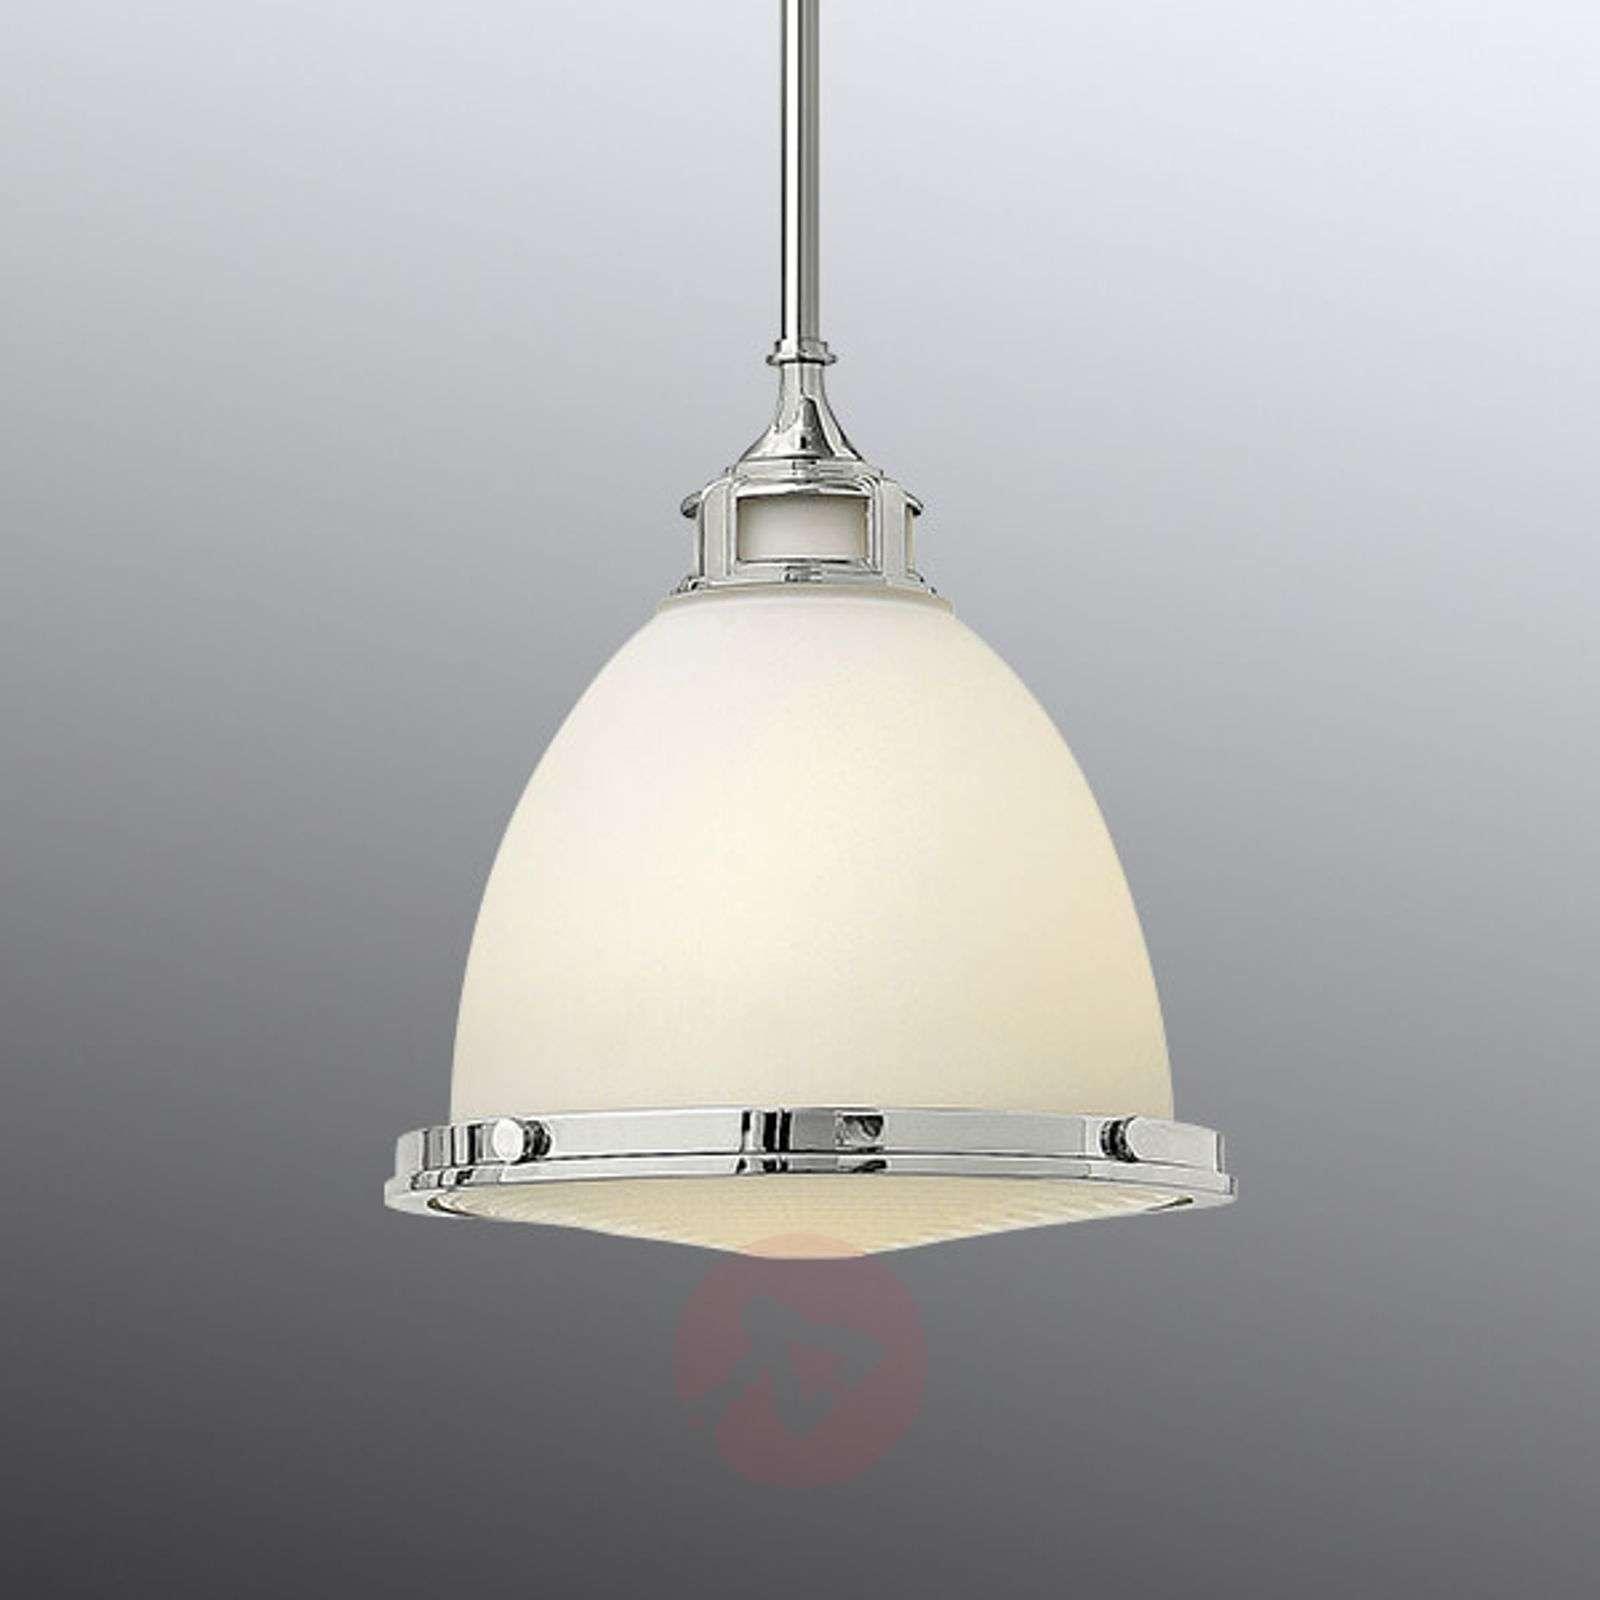 best sneakers ddef5 cde38 Amelia - attractive pendant lamp in vintage design